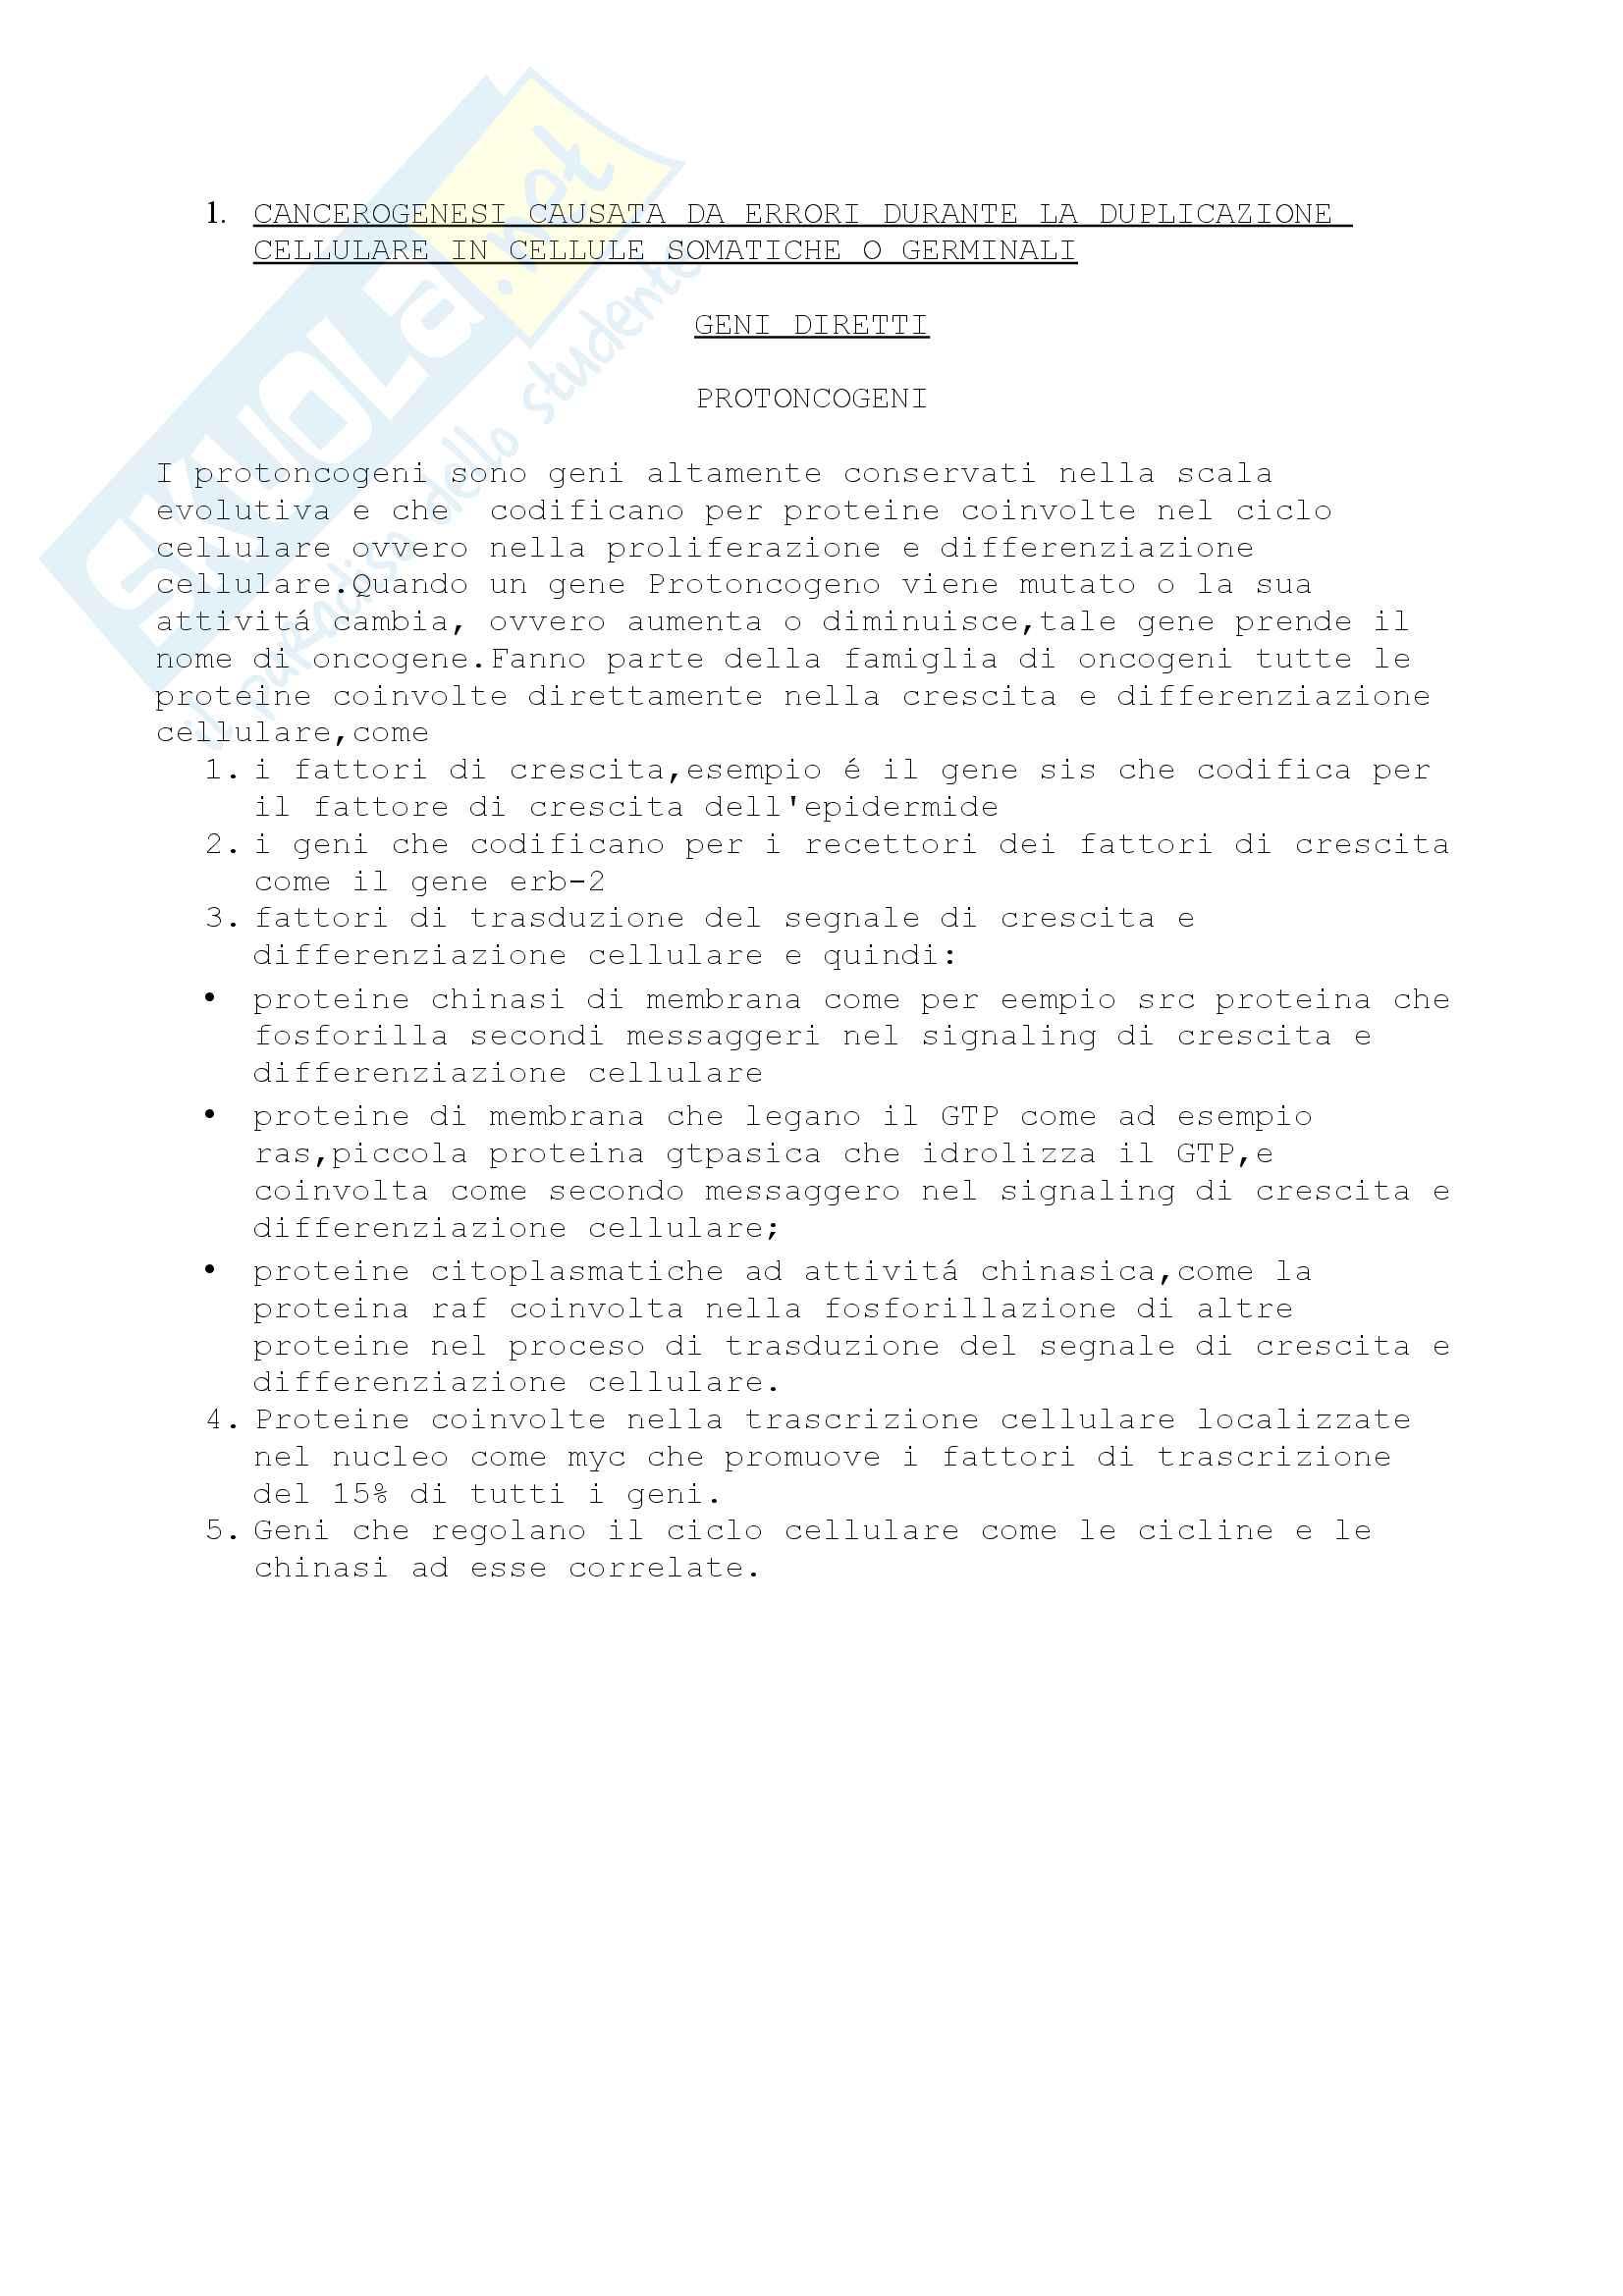 Cancerogenesi Pag. 2